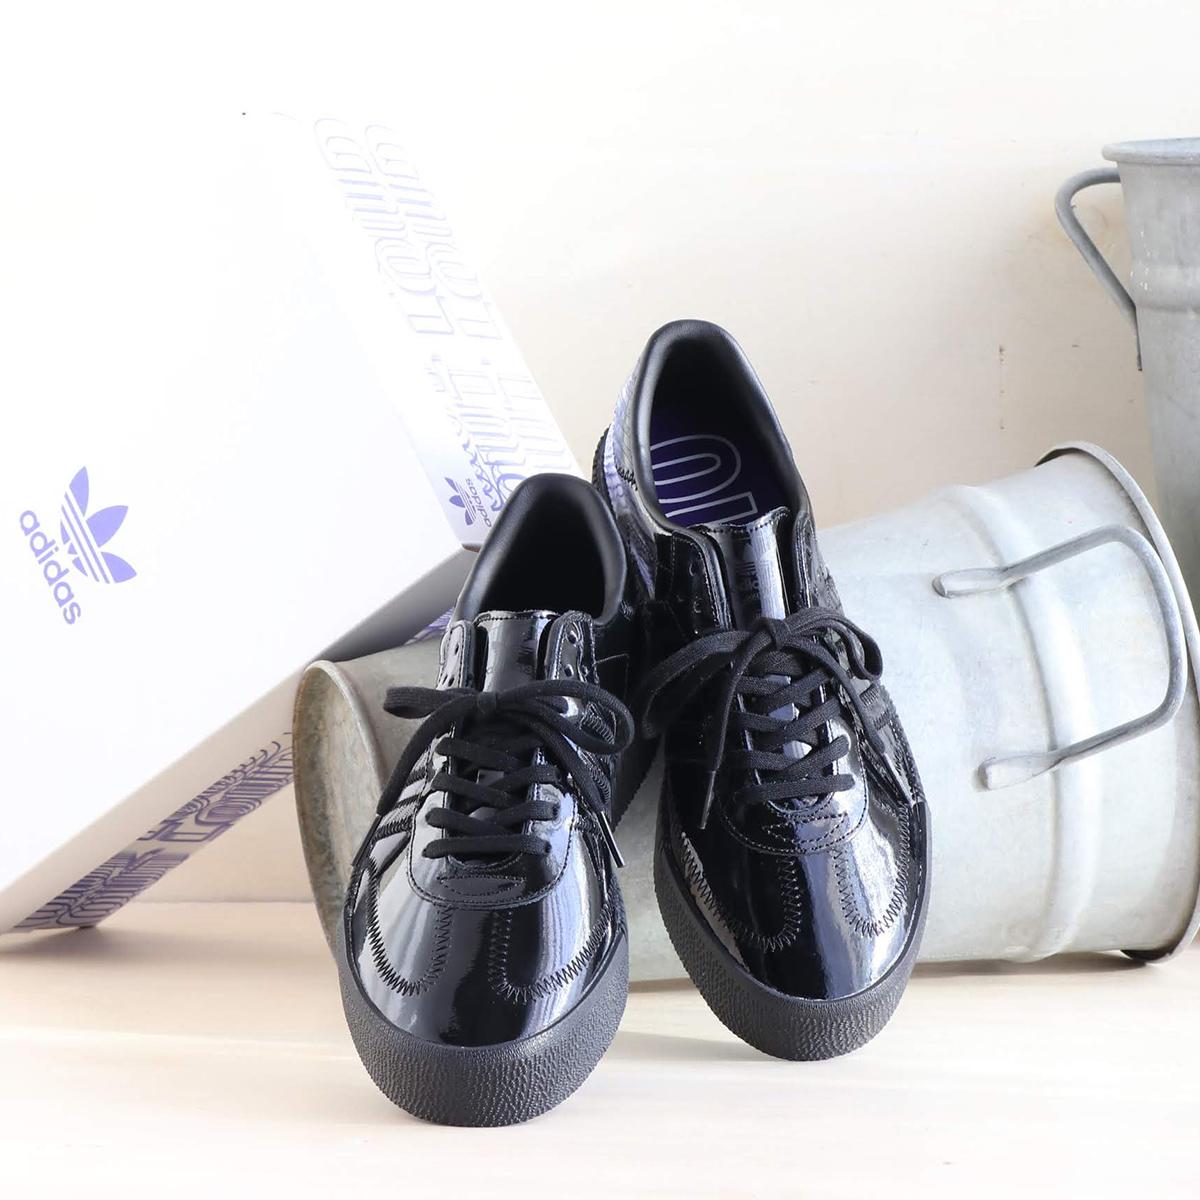 adidas Originals SAMBAROSE W(アディダスオリジナルス サンバローズ W)CORE BLACK/CORE BLACK/ACTIVE PURPLE【メンズ パーカー】19SS-I